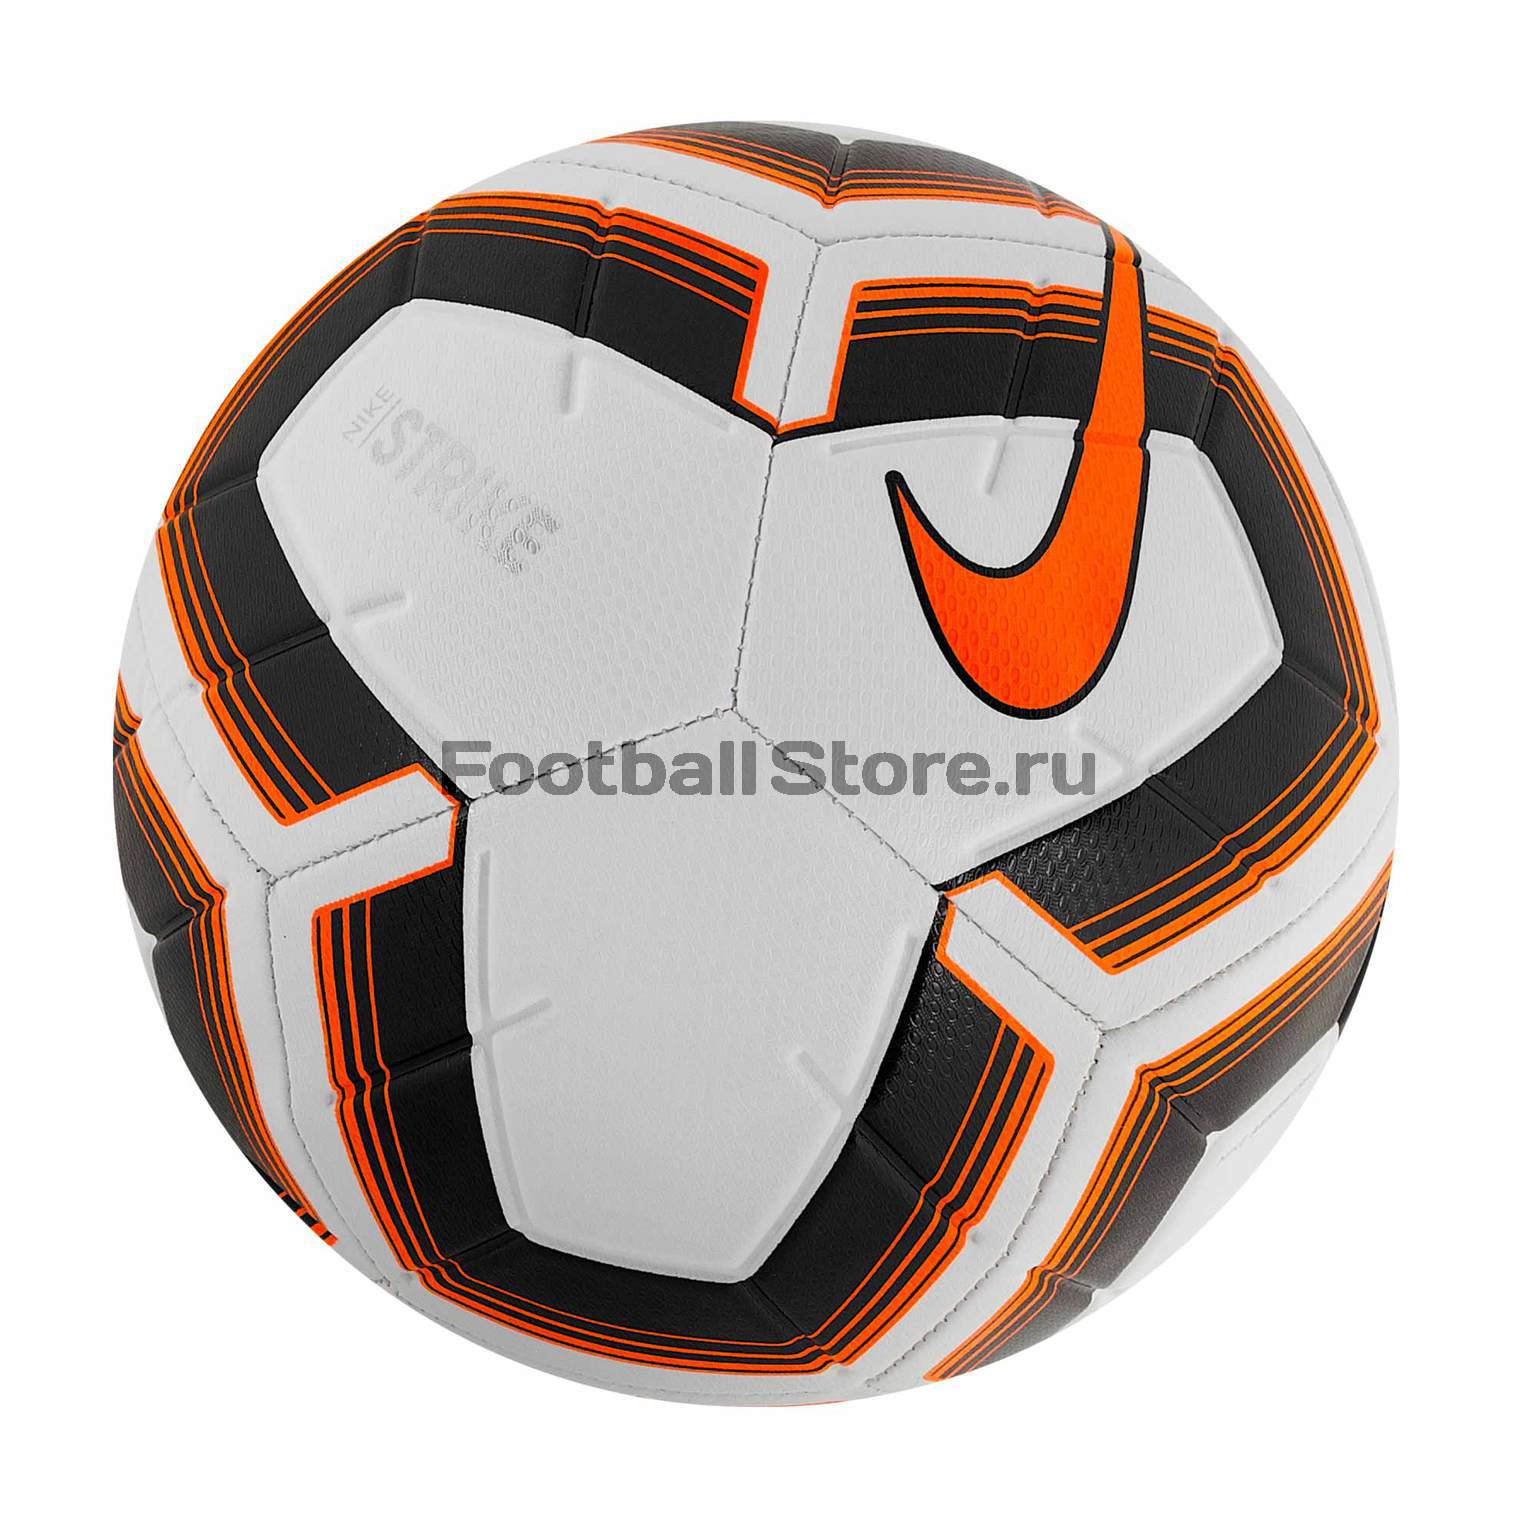 Футбольный мяч Nike Strike Team SC3535-101 футбольный мяч nike nk strike team 290g sc3127 100